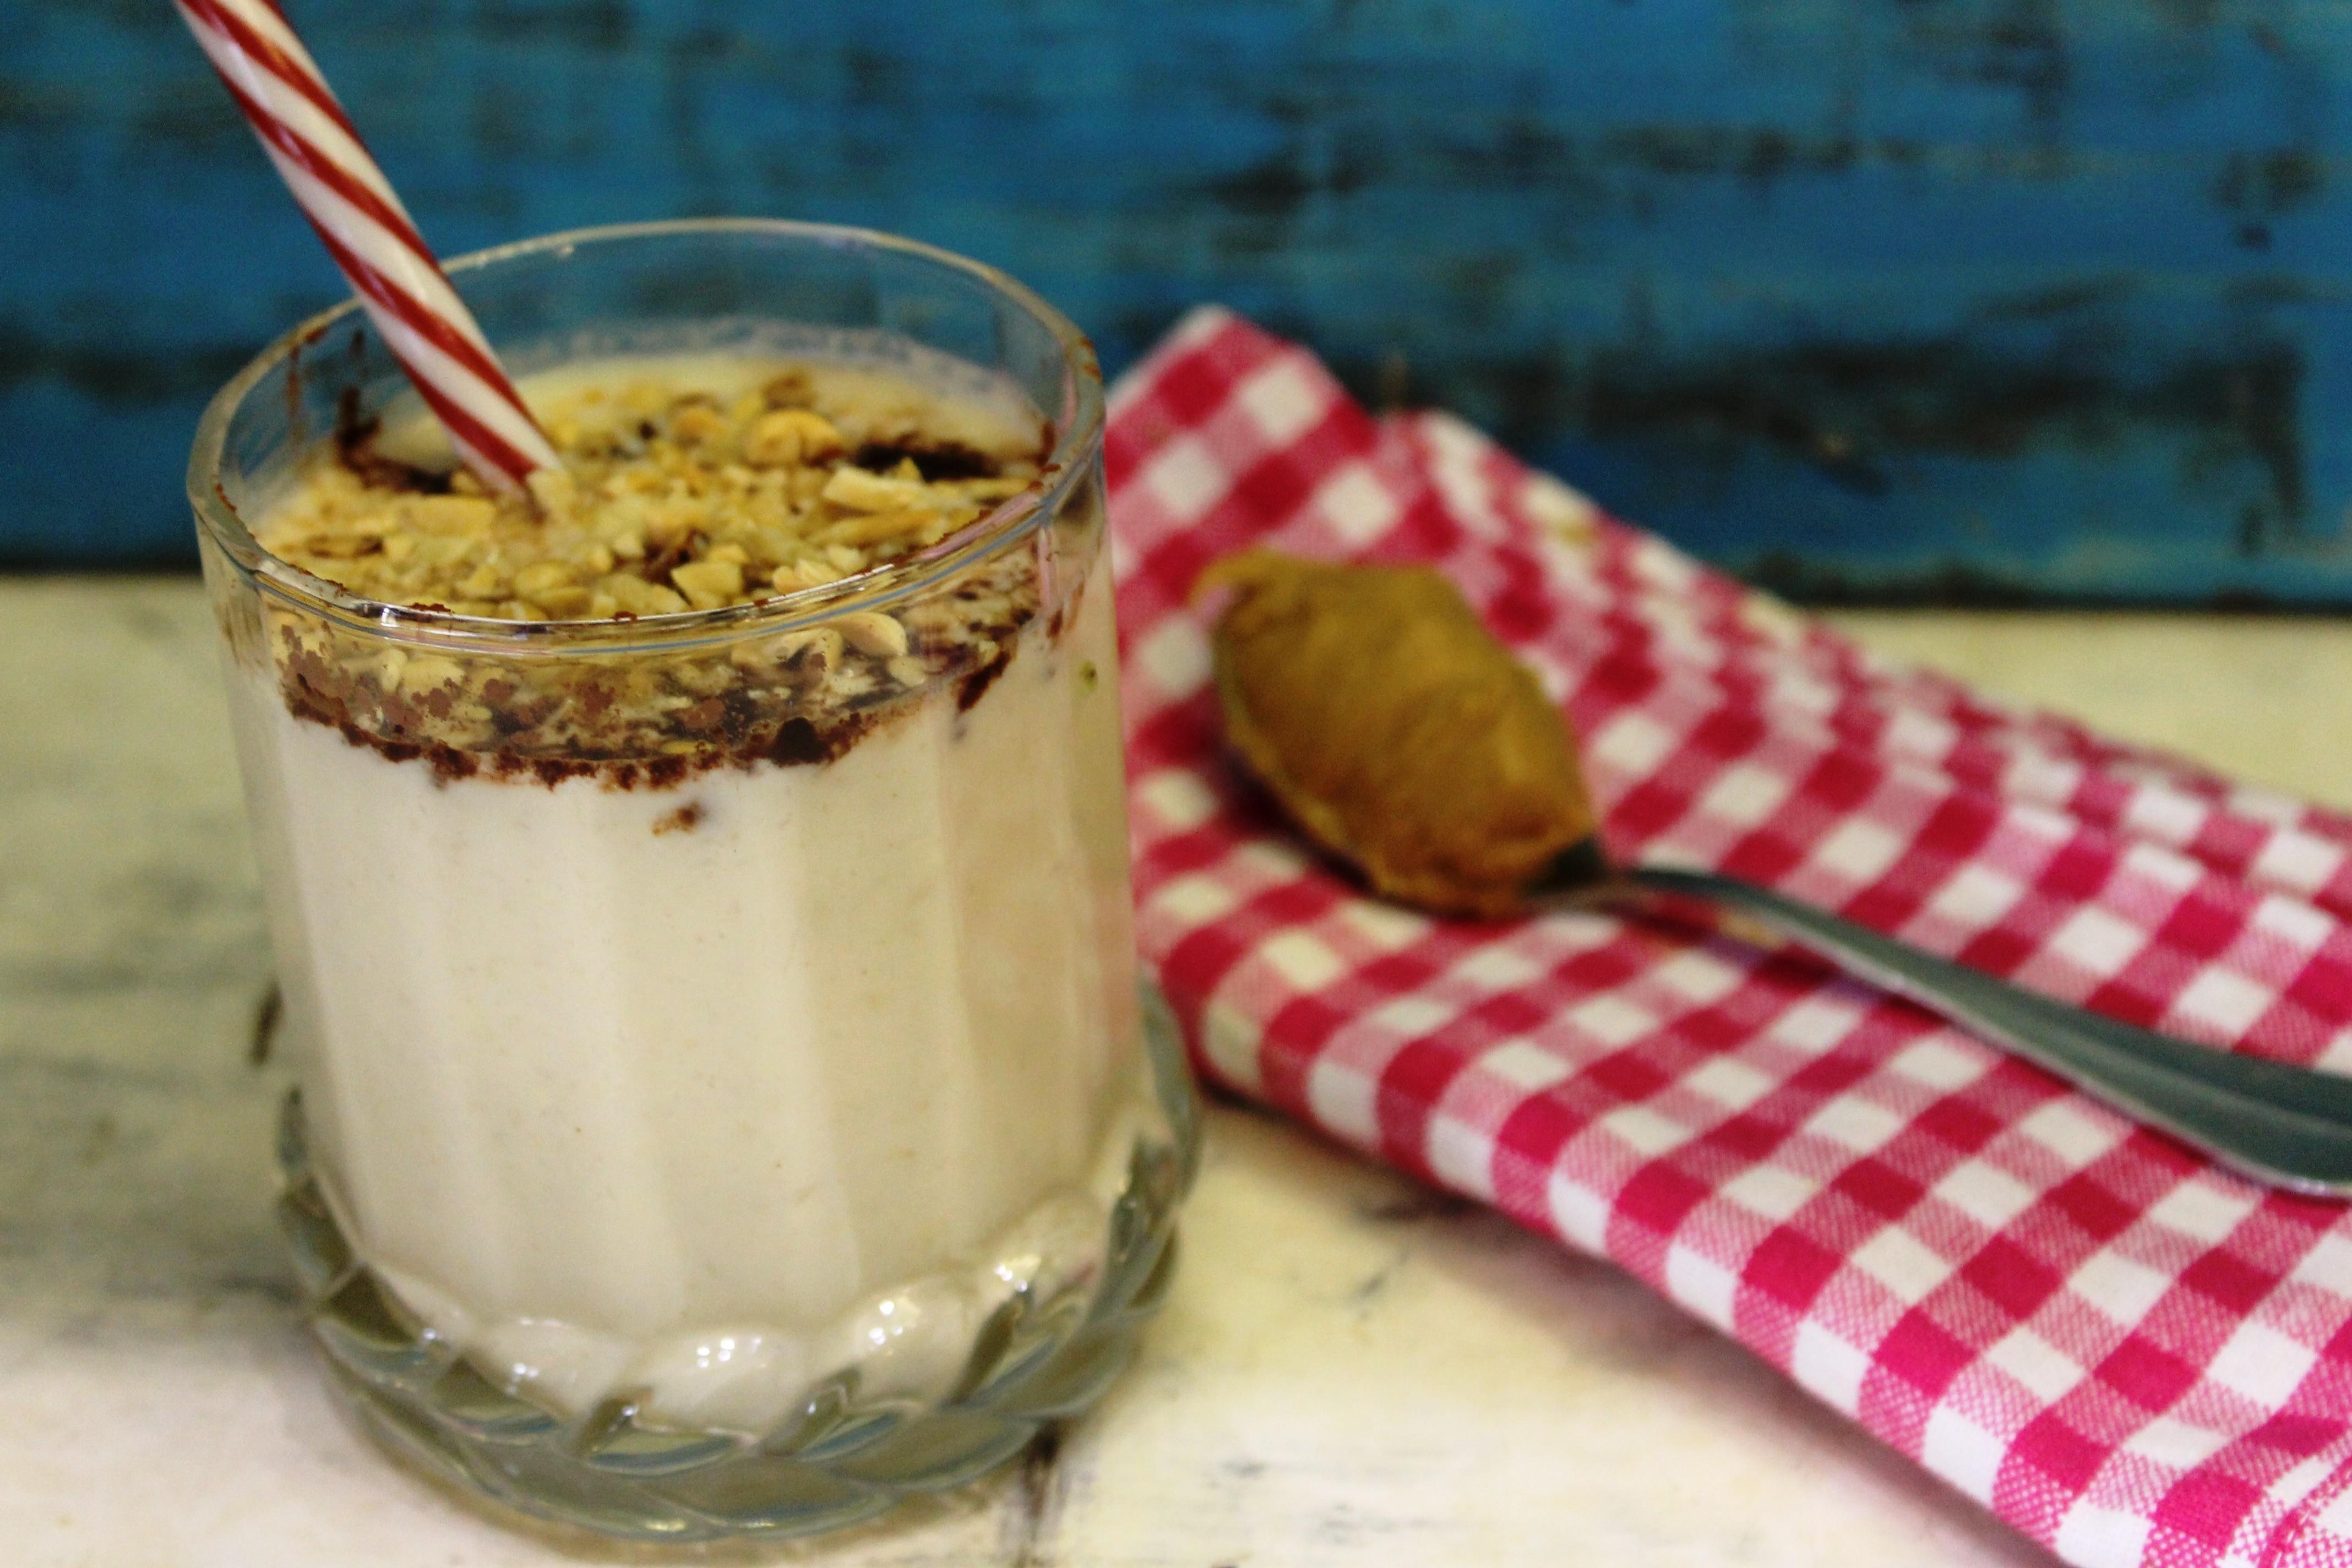 shakarakand smoothie